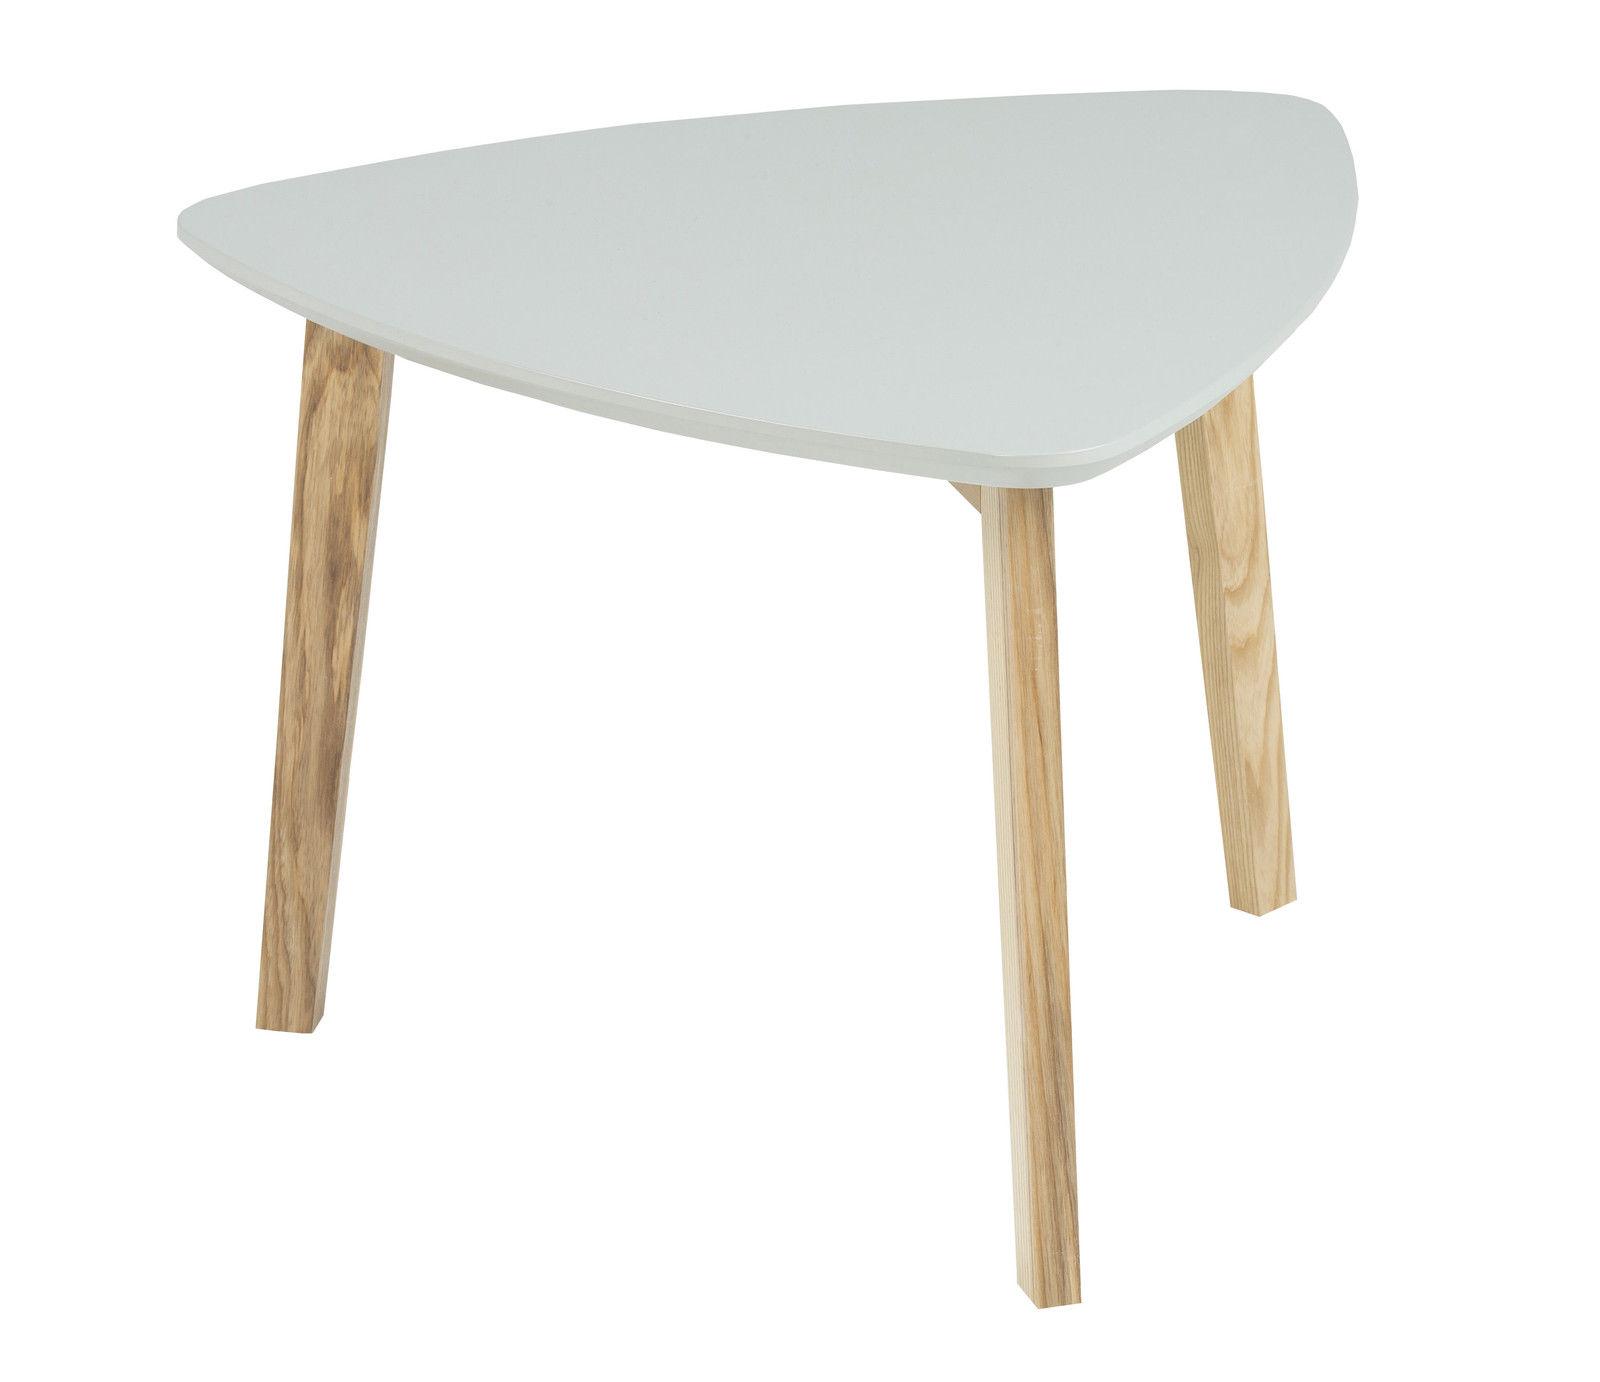 pkline table d 39 appoint gris table basse table table basse table de coin fr ne ebay. Black Bedroom Furniture Sets. Home Design Ideas